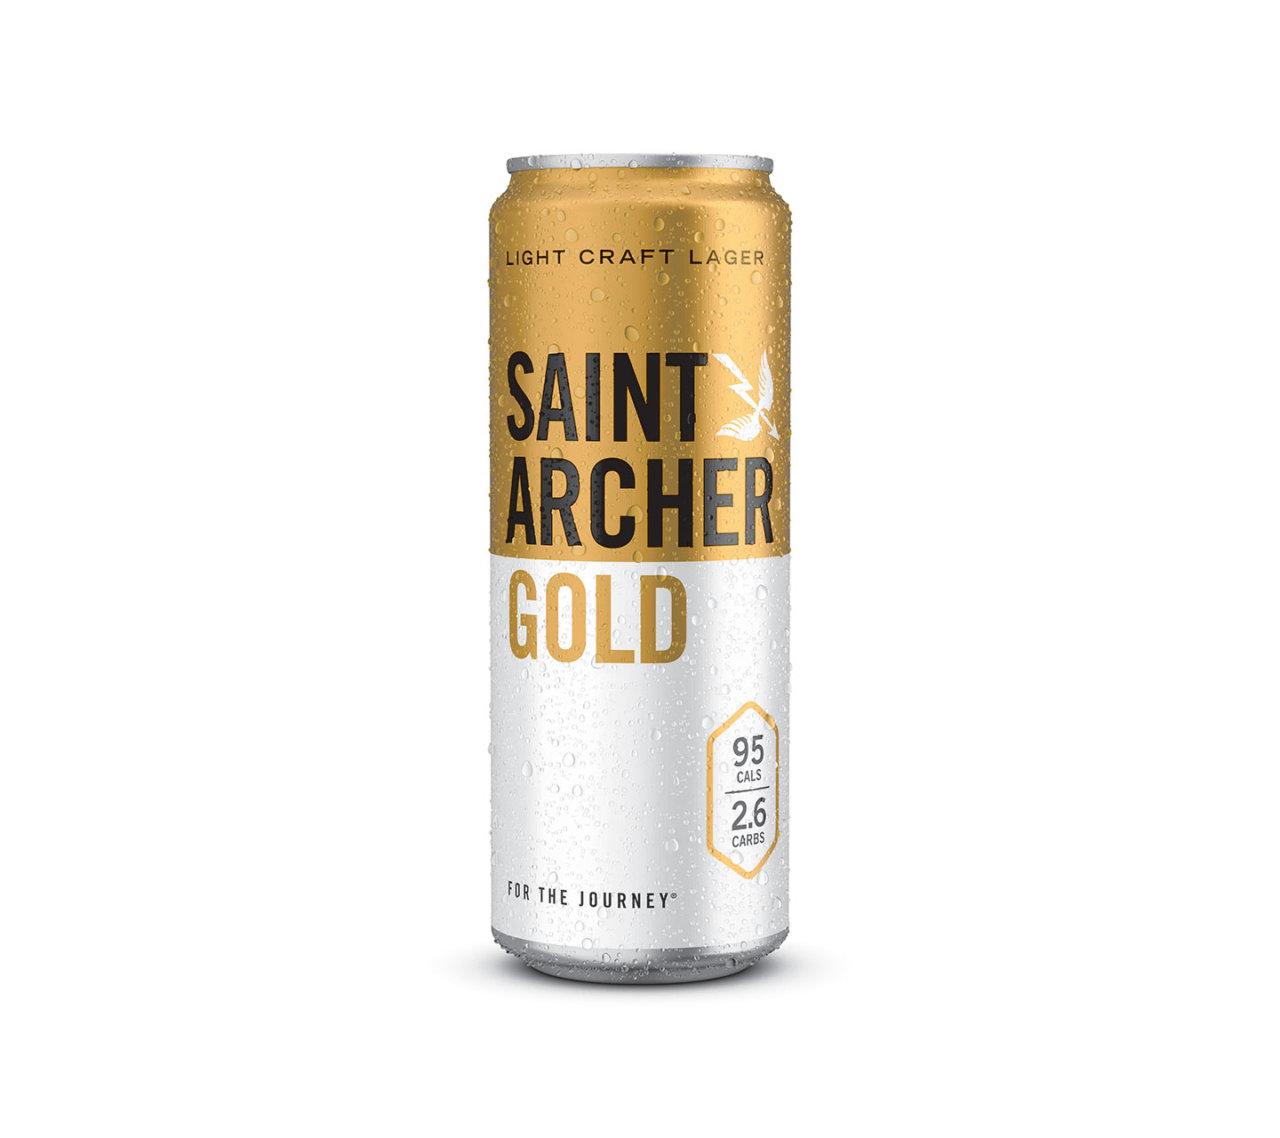 saint-archer-gold-product-can-1280x1138.jpg